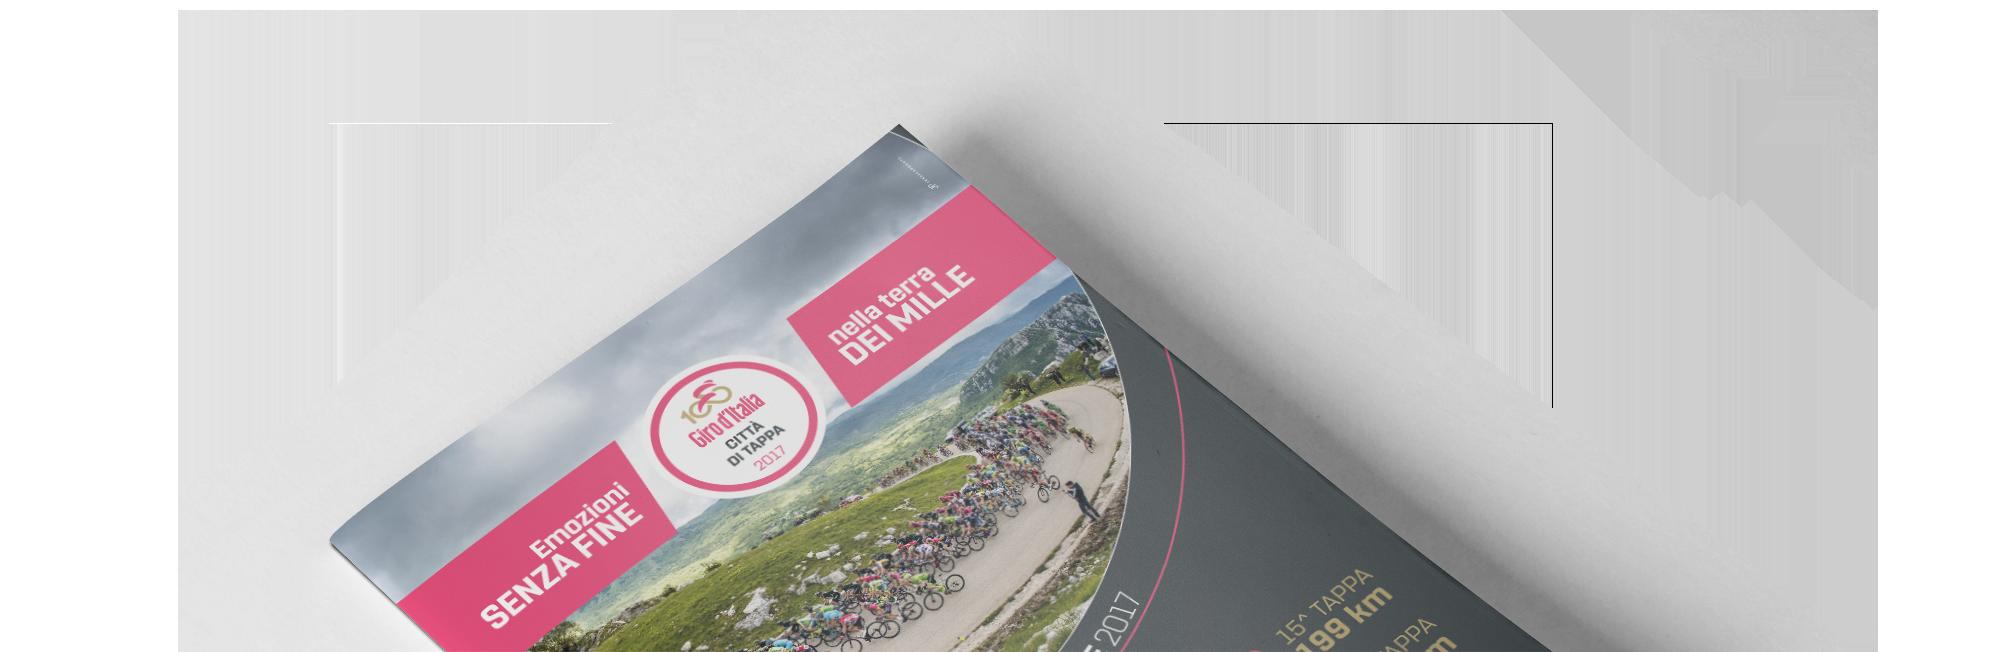 Brochure Tappe Bergamasche 2017 - Giro d'Italia